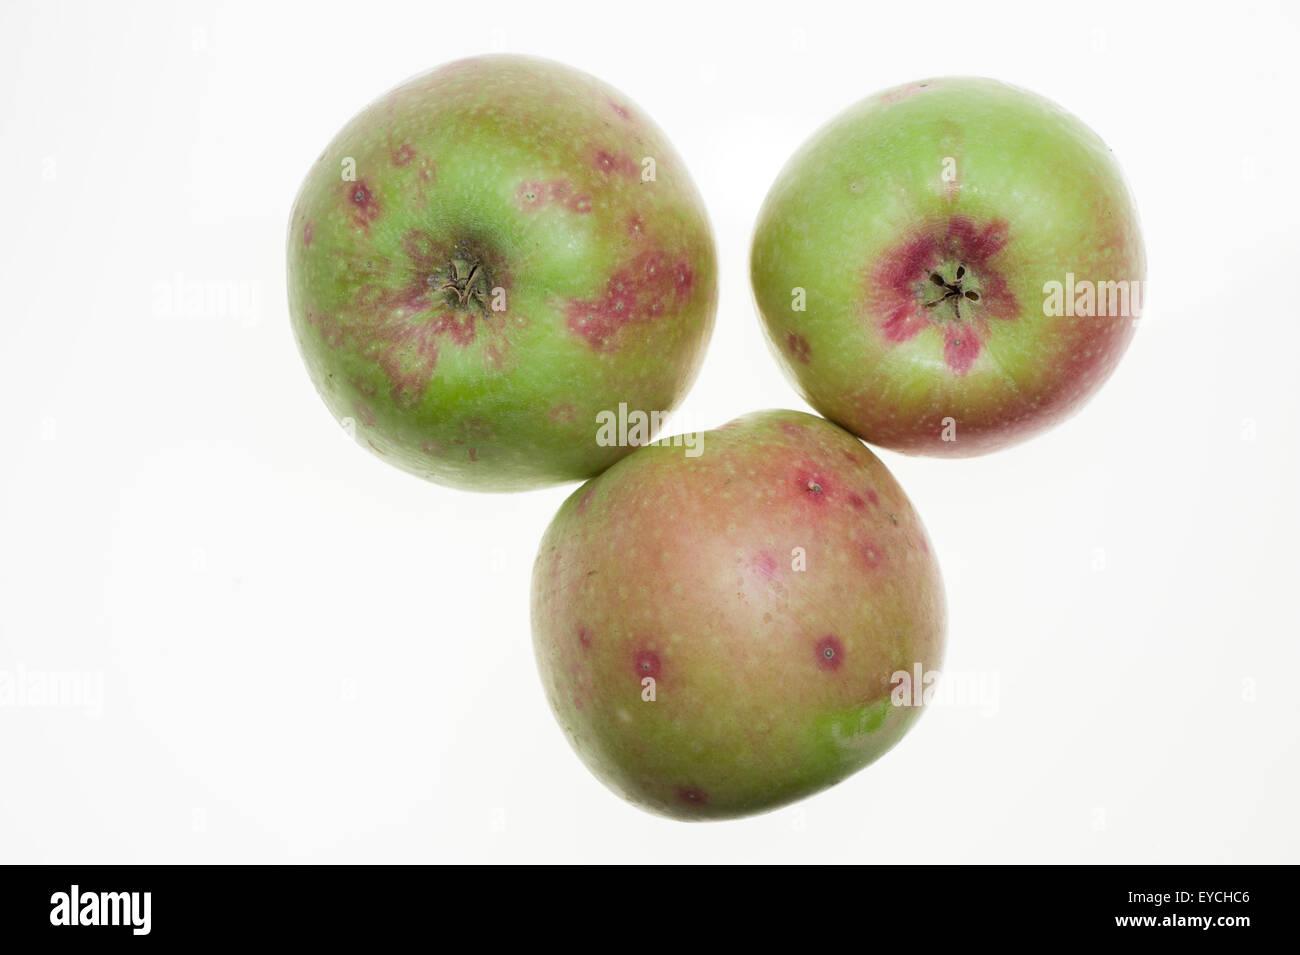 San Jose scale damage to apples - Stock Image